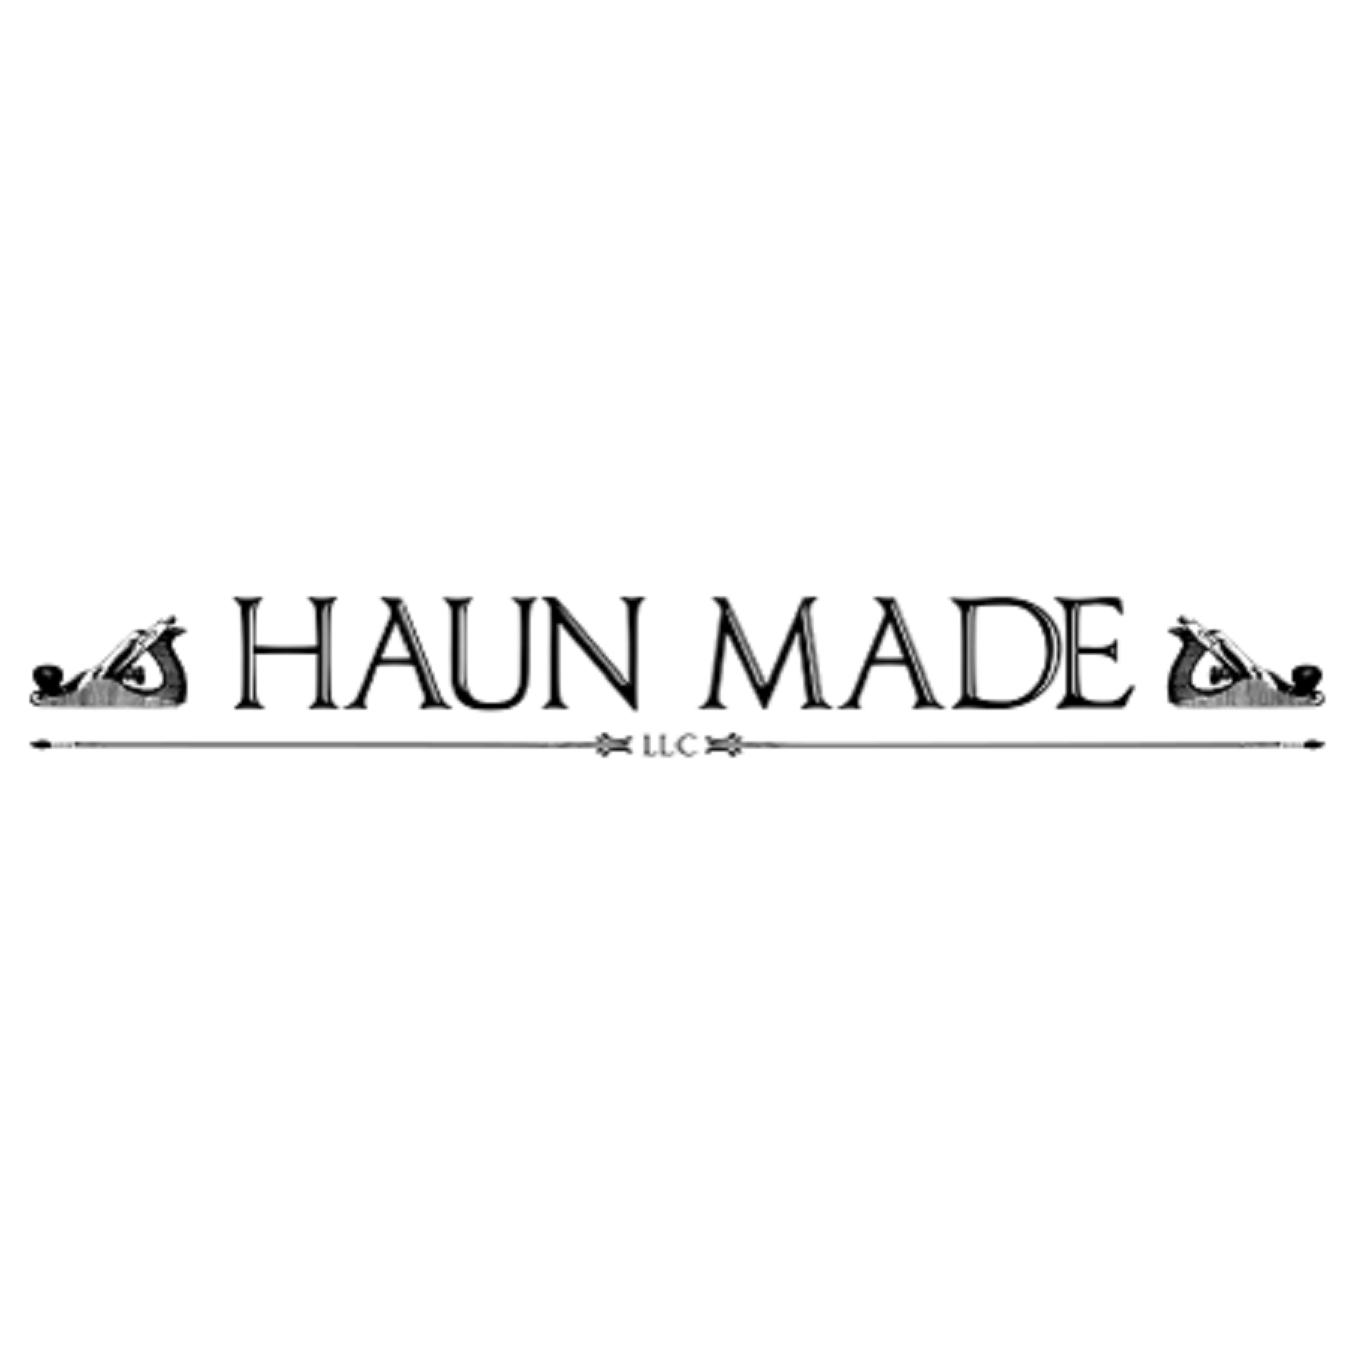 Haun Made LLC